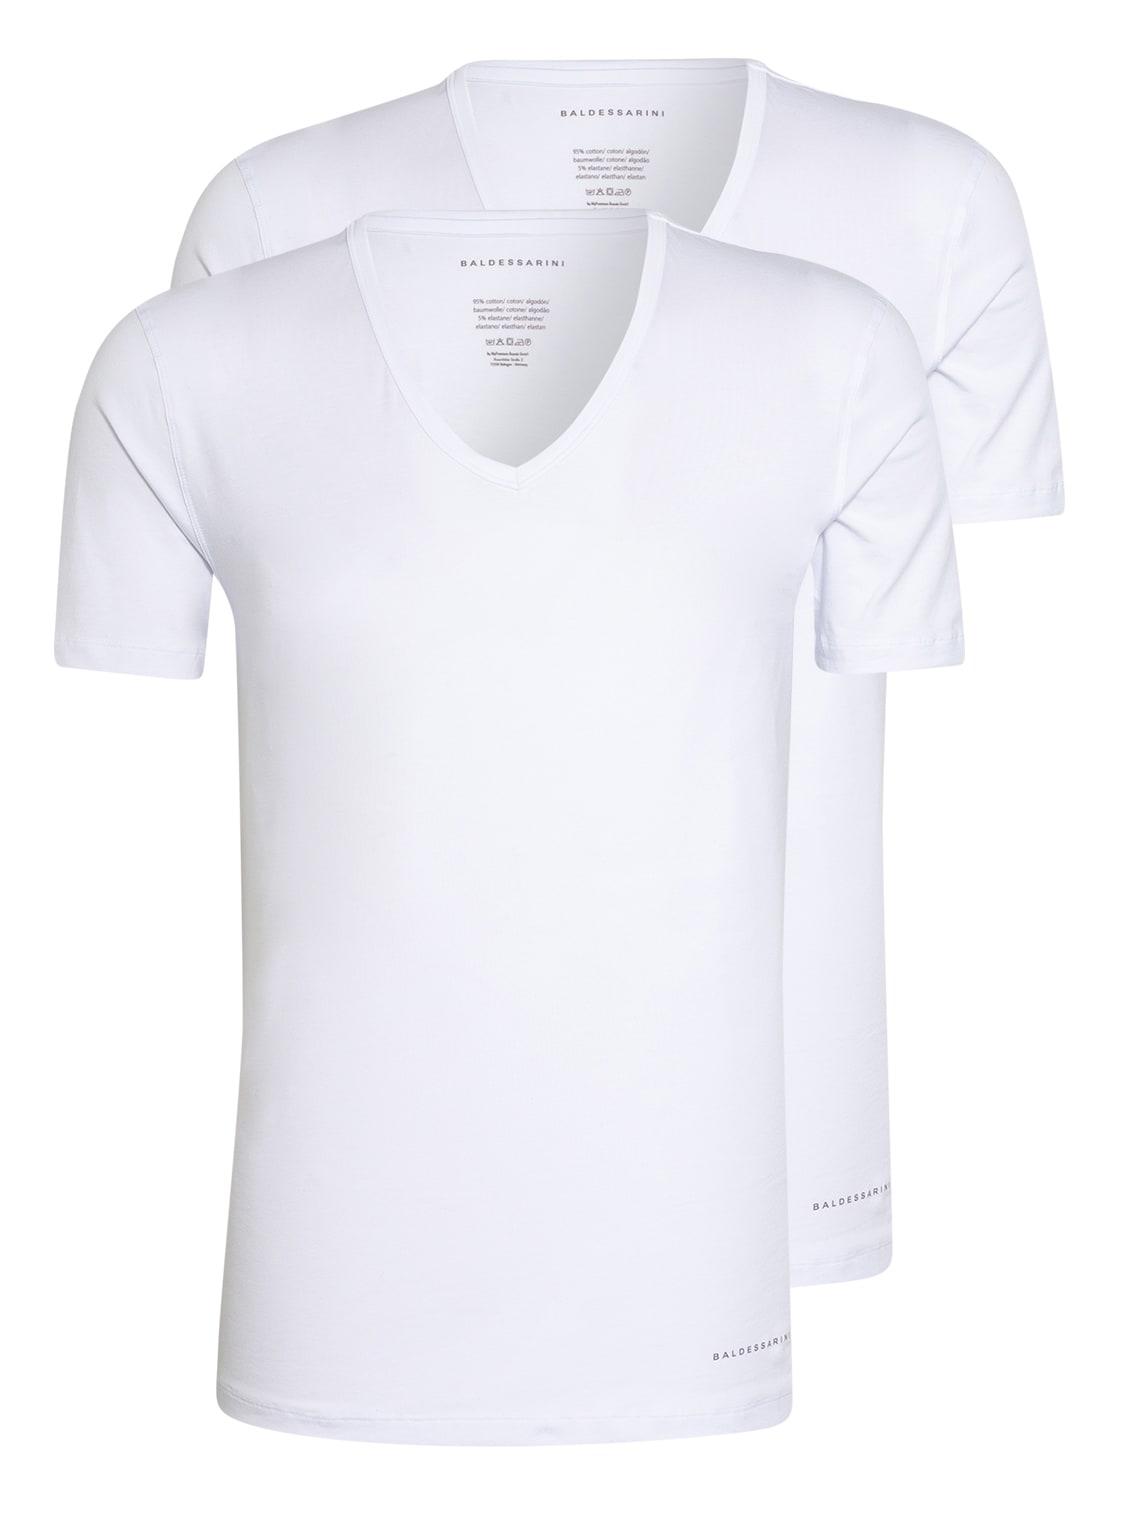 Image of Baldessarini 2er-Pack V-Shirts weiss